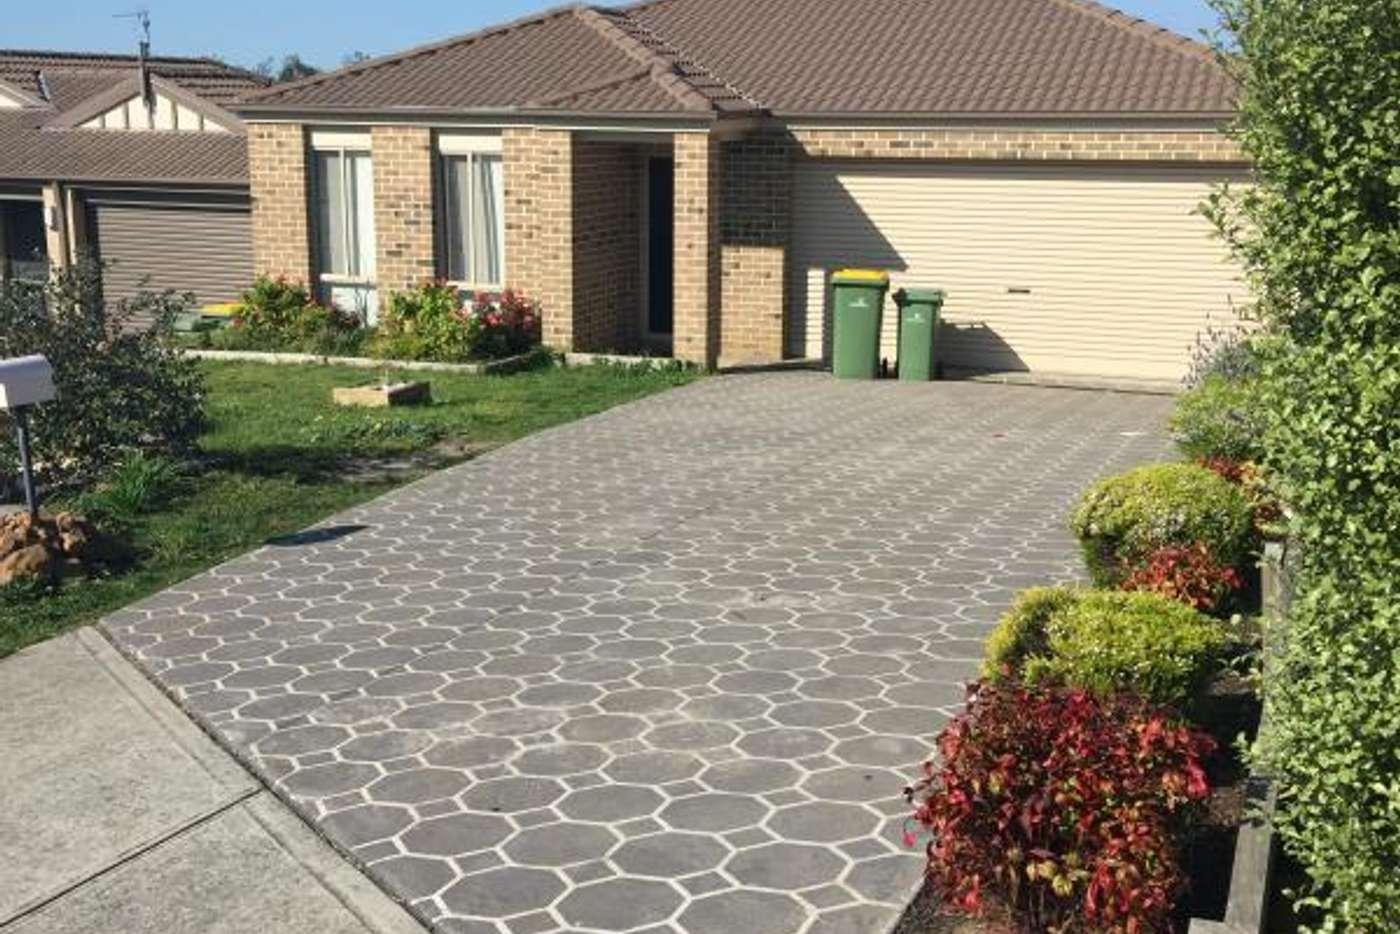 Main view of Homely house listing, 14 Jennifer Court, Pakenham VIC 3810